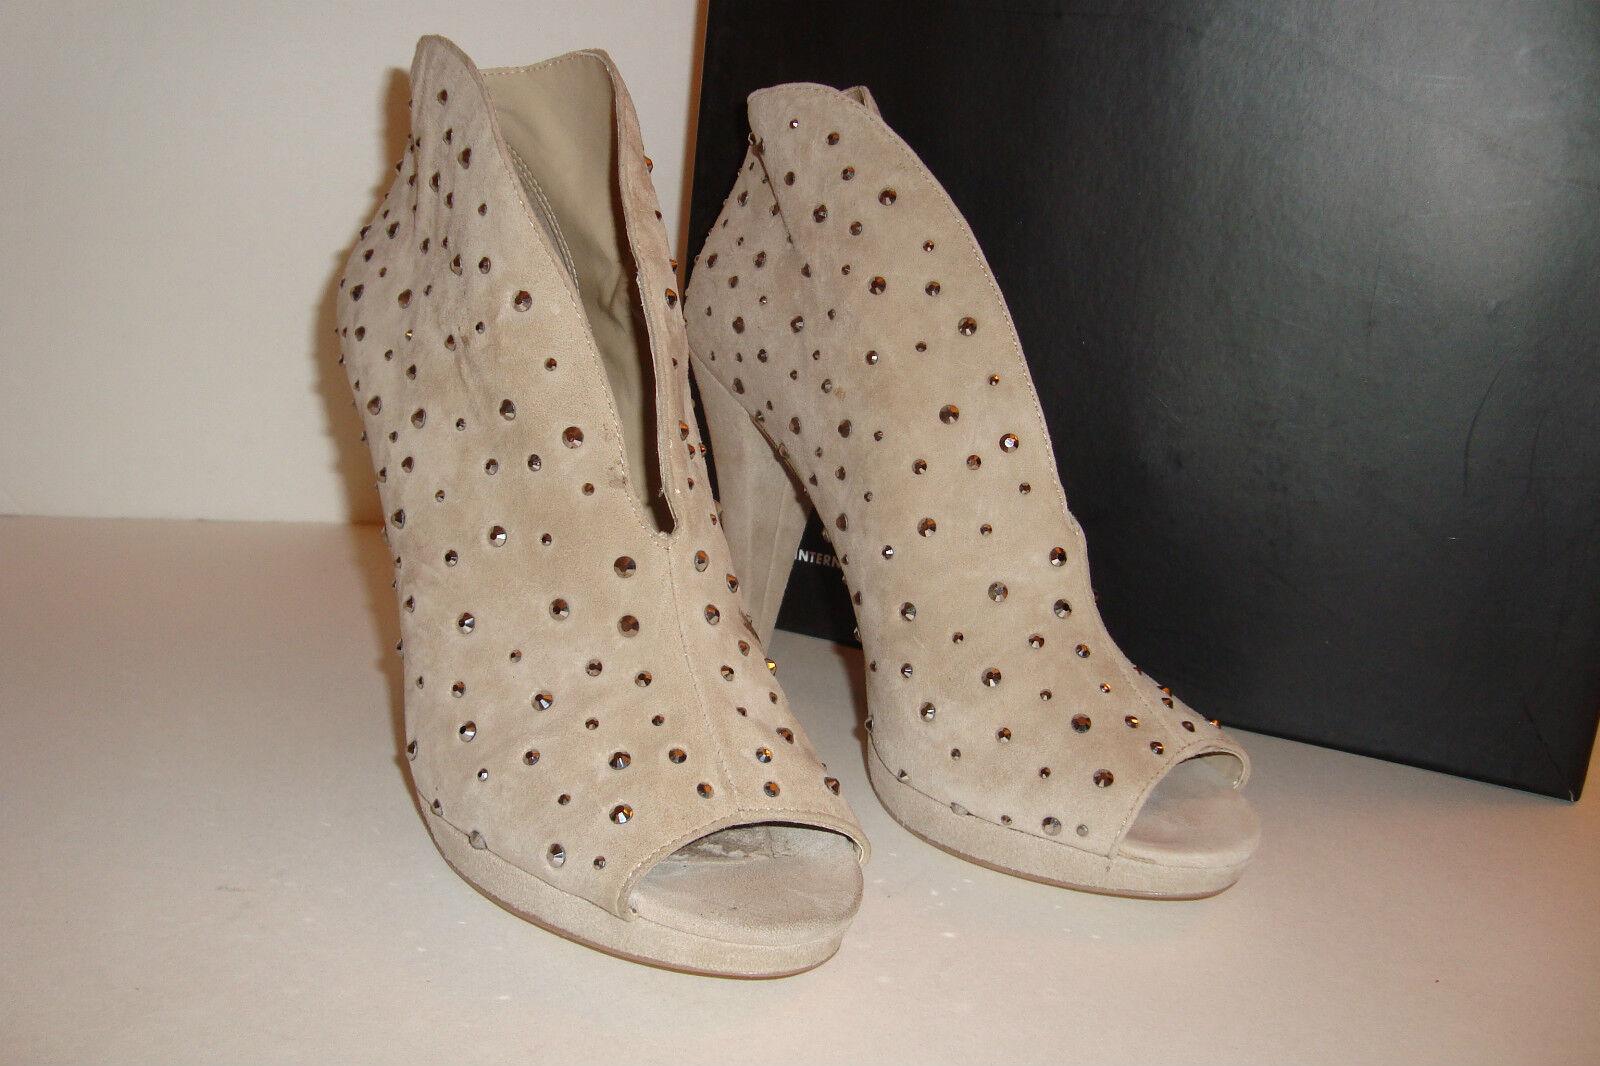 Inc International Concepts para mujer mujer mujer Tiara tan Biscuit Tacones Zapatos 8 Med pantalla  moda clasica